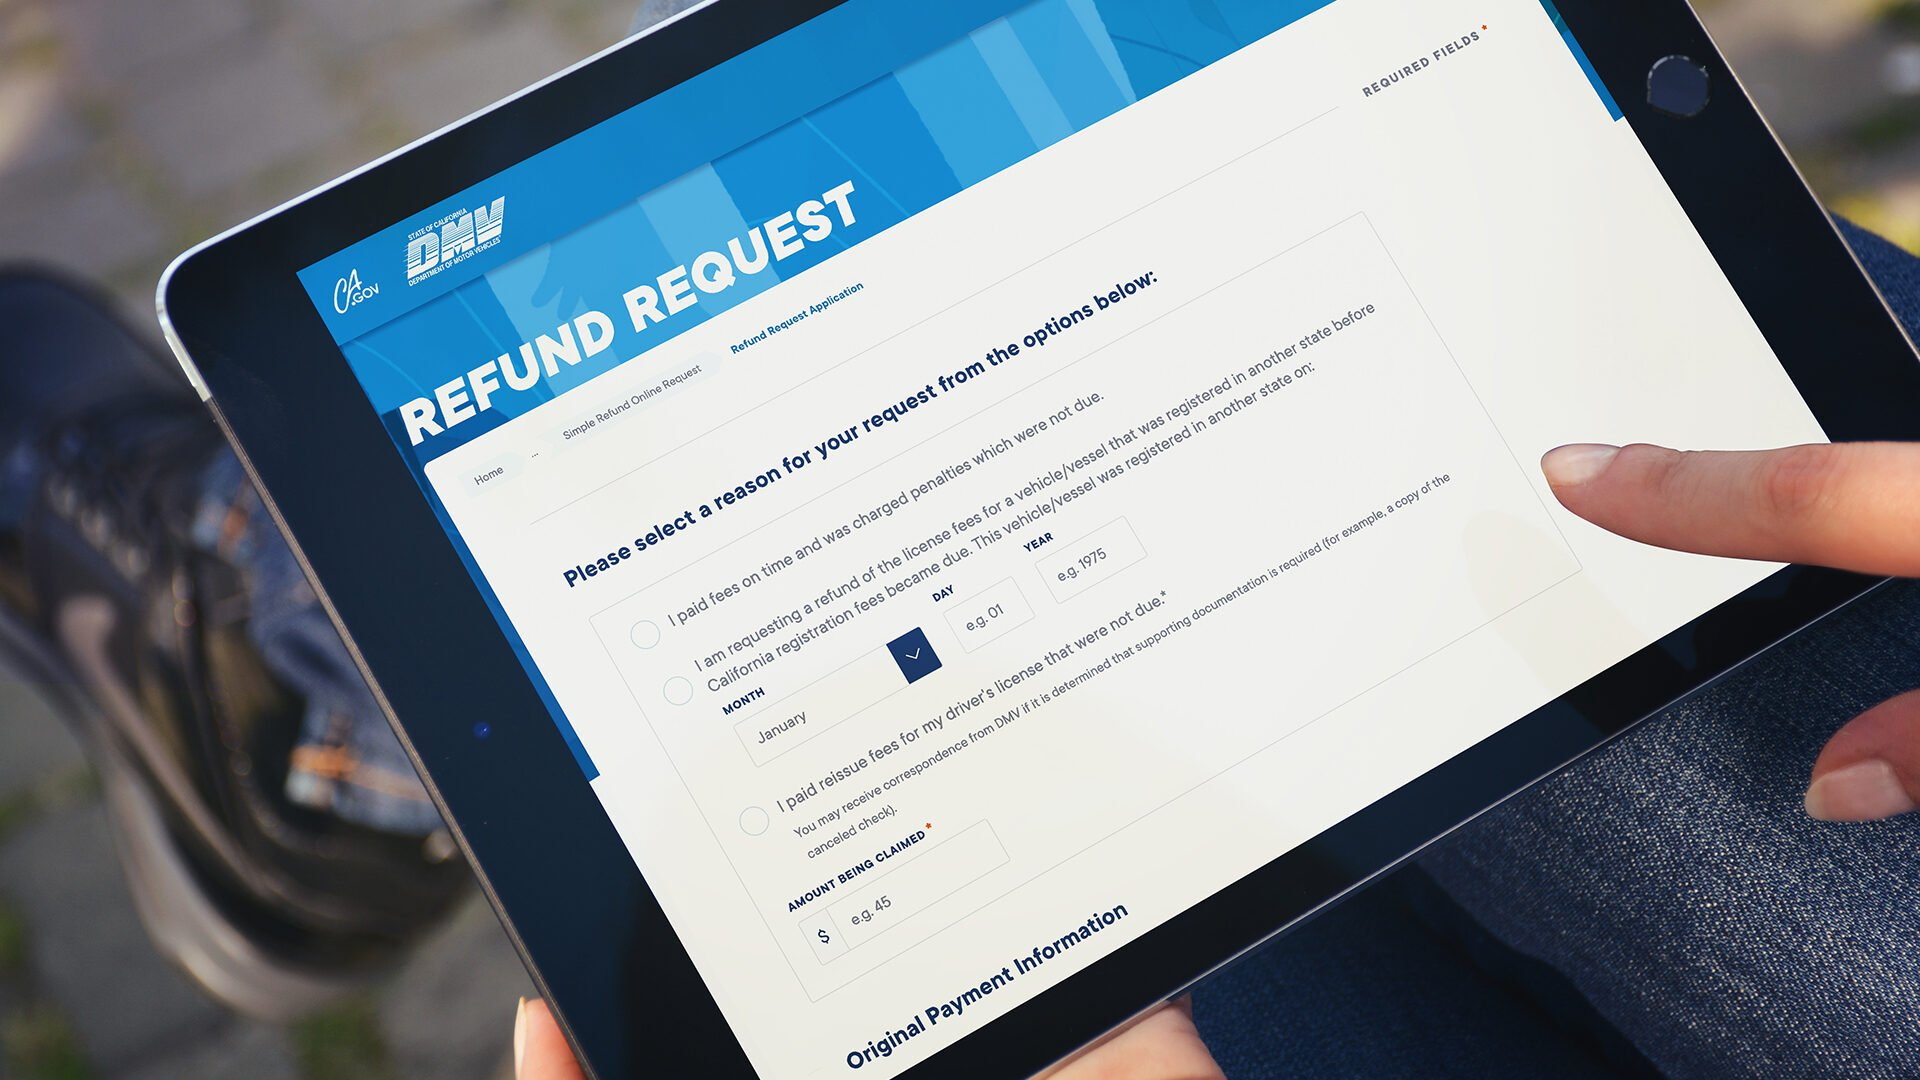 DMV Web Applications